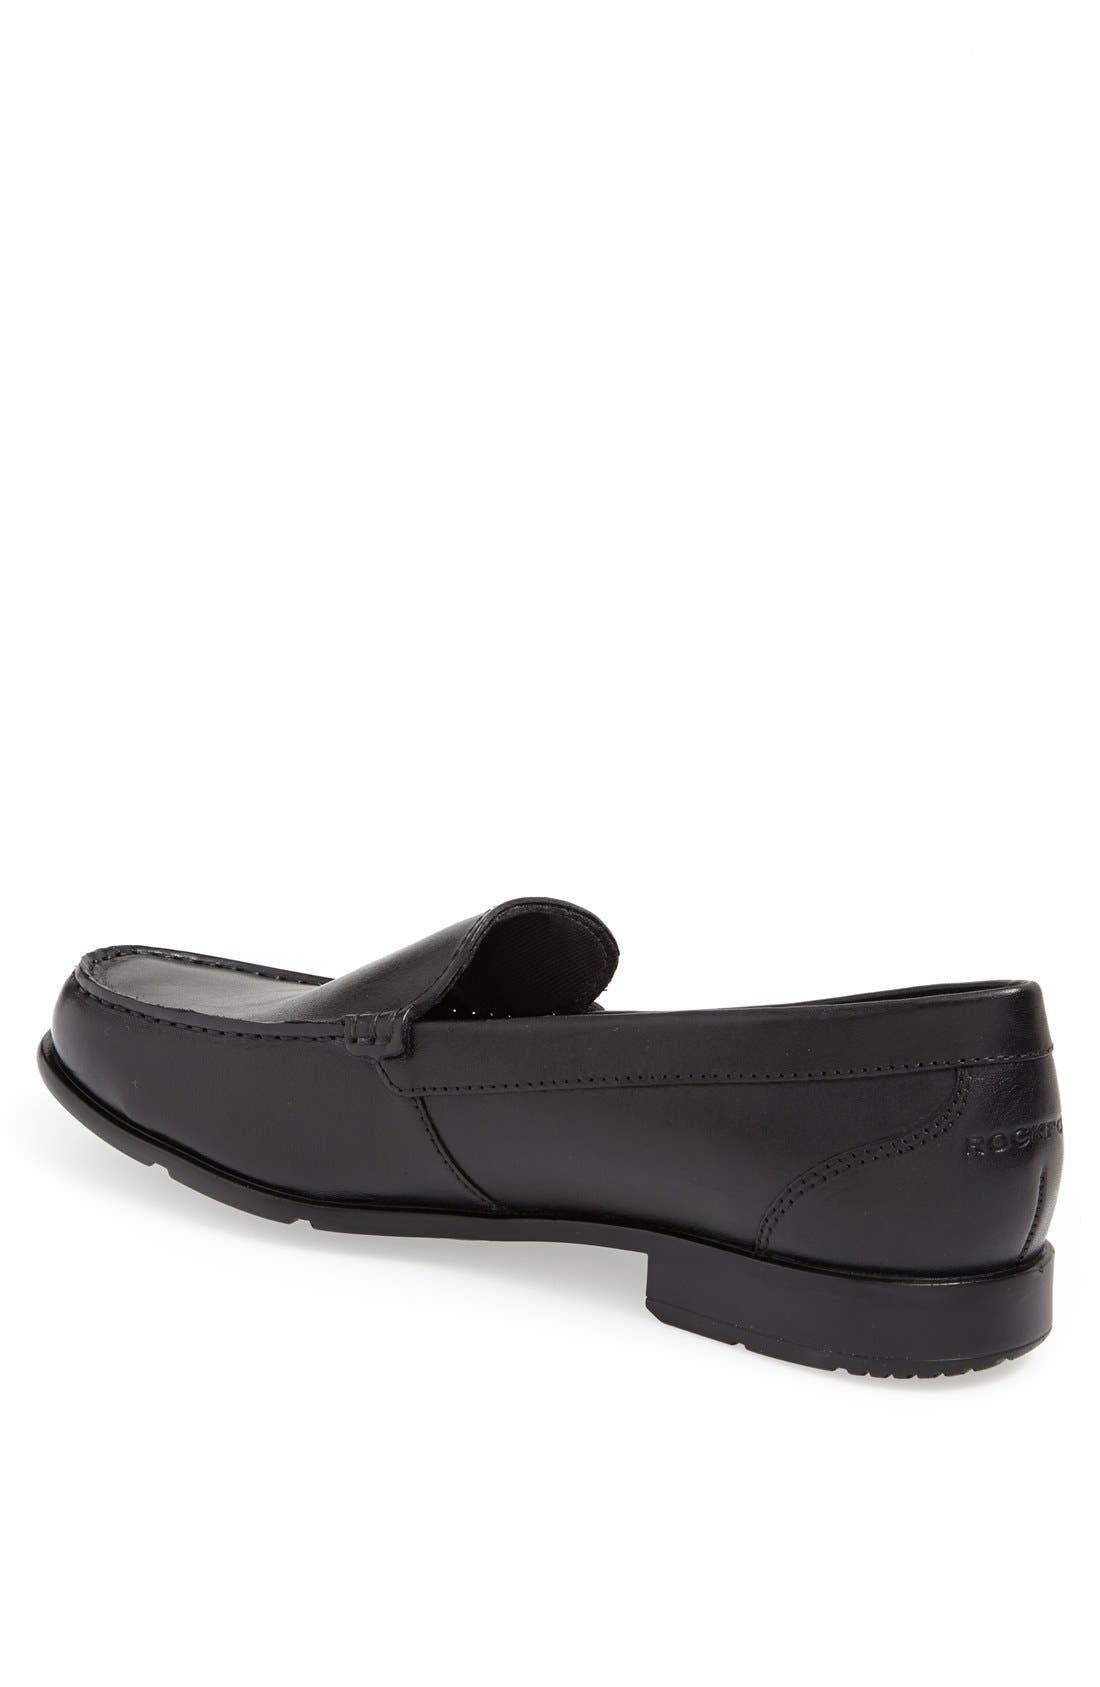 Alternate Image 2  - Rockport Classic Venetian Loafer (Men)